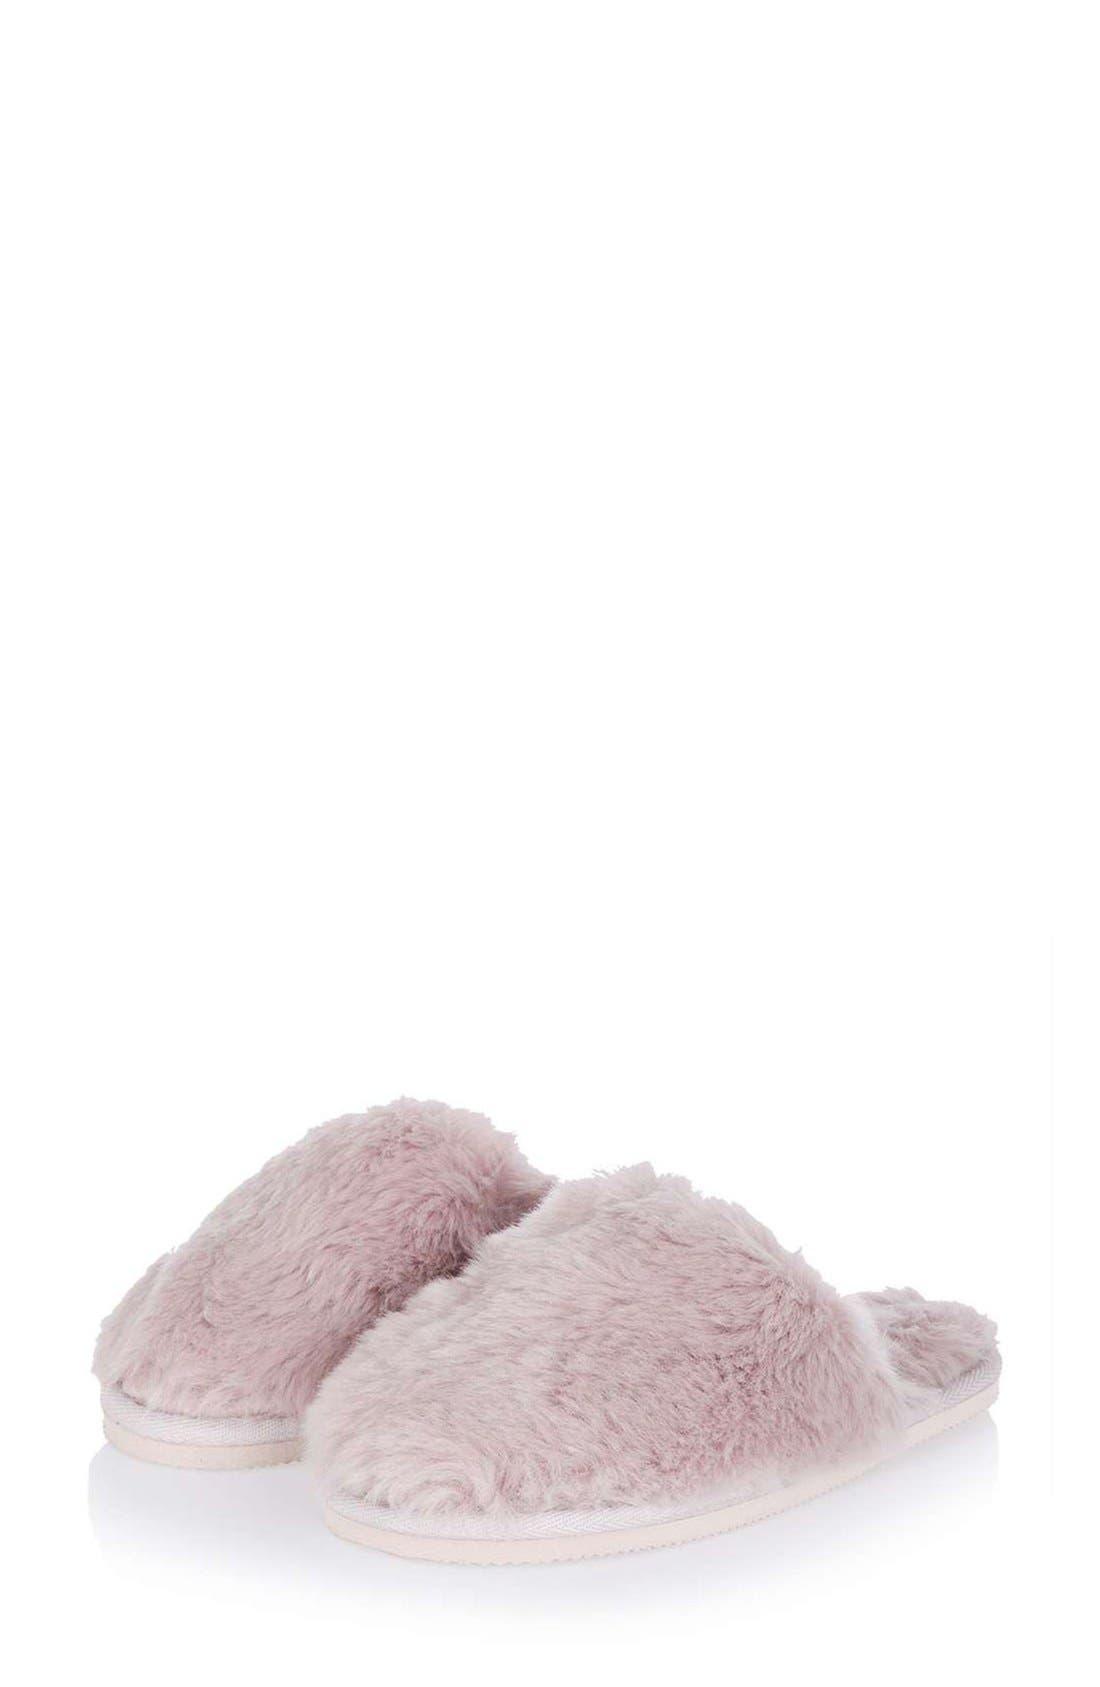 Alternate Image 1 Selected - Topshop Furry Mule Slippers (Women)